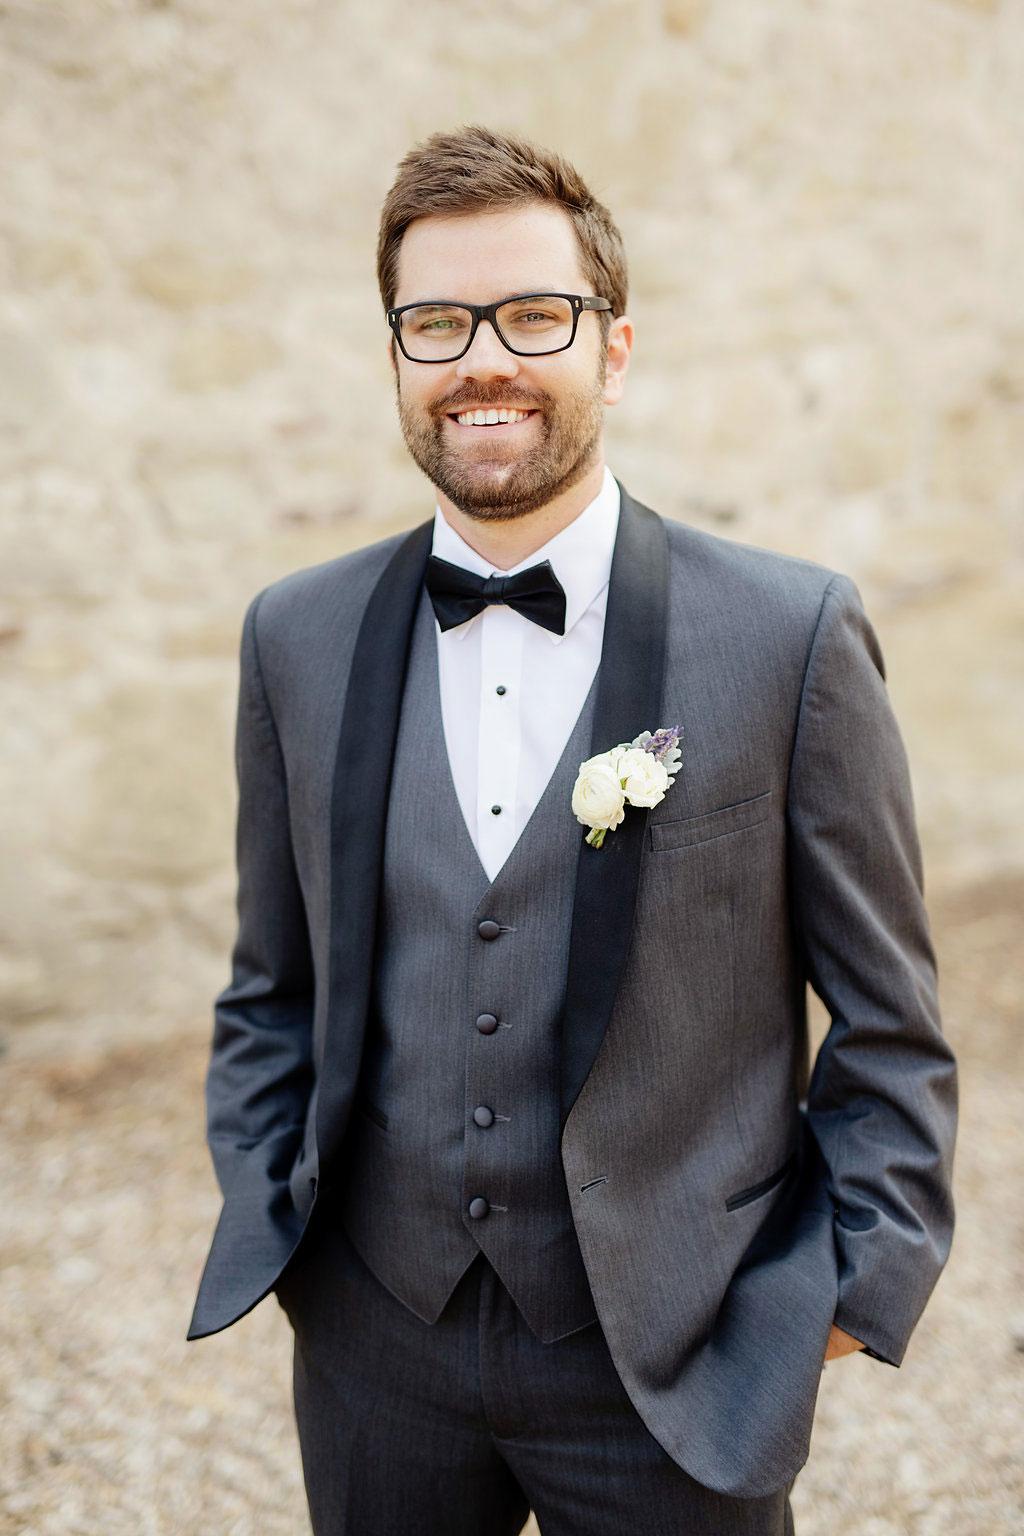 Groom in custom black suit at Serra Plaza wedding.